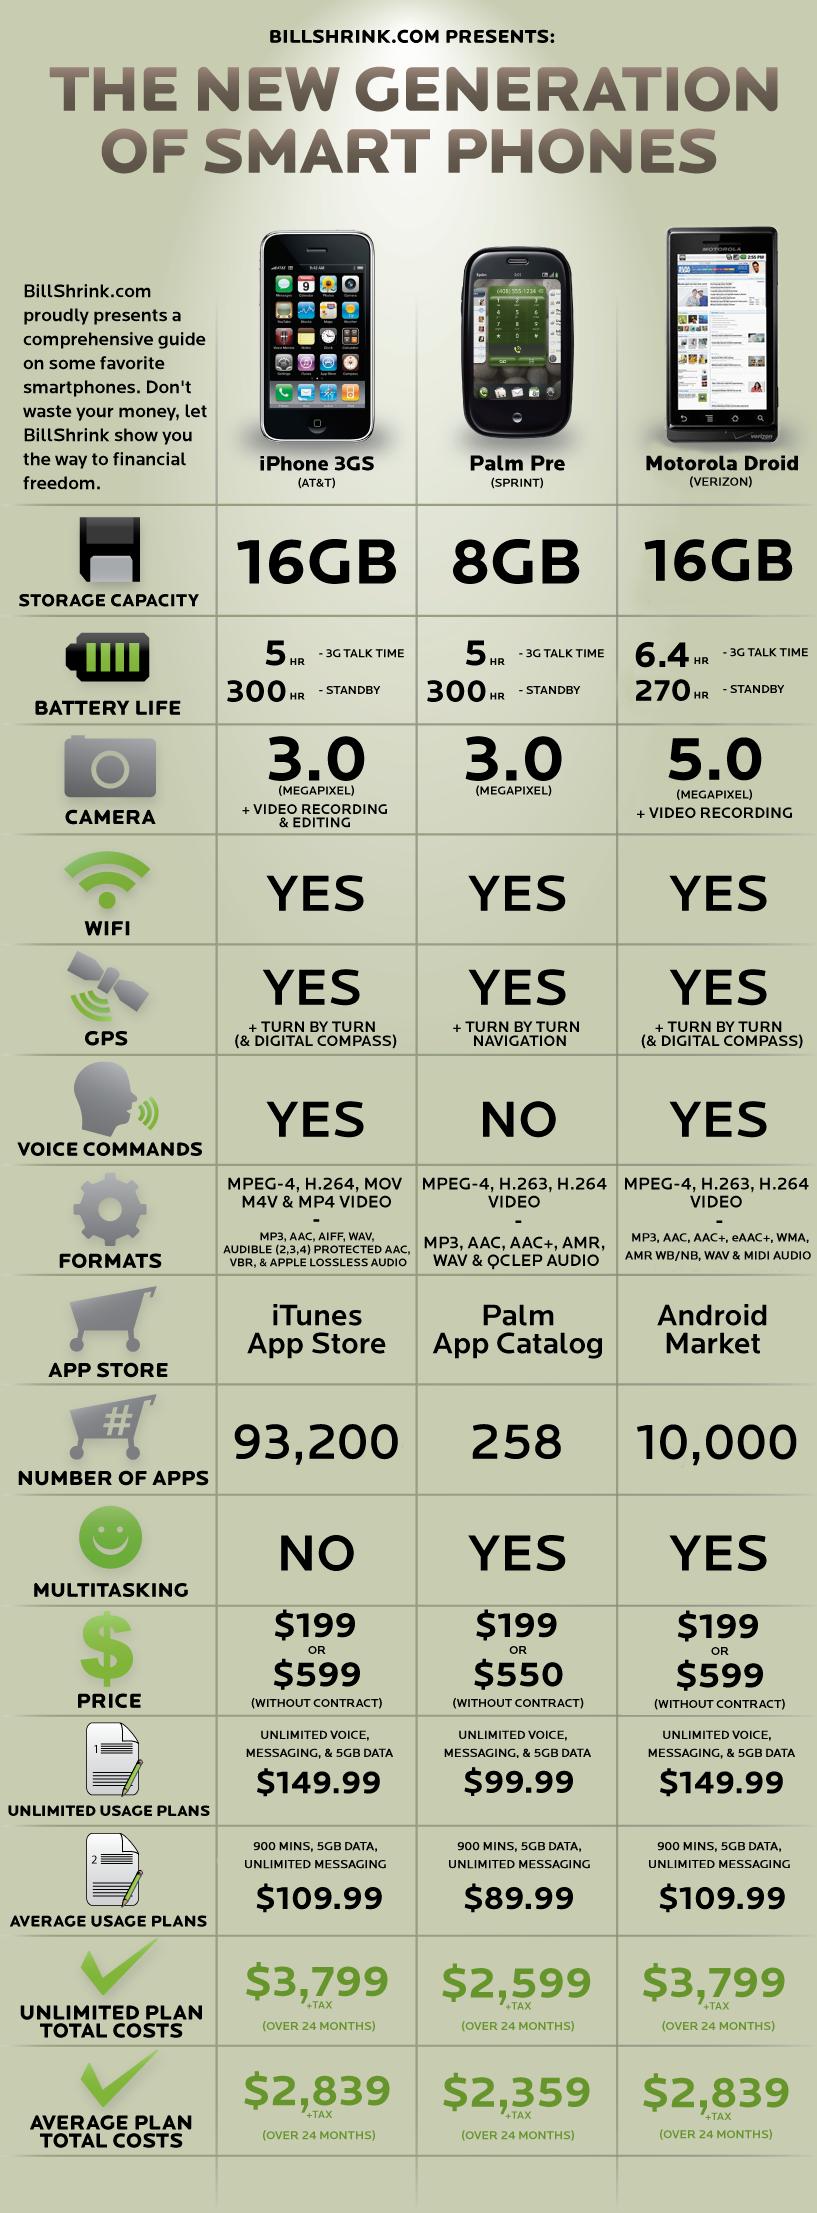 iphone-3gs-vs-palm-pre-vs-motorola-droid